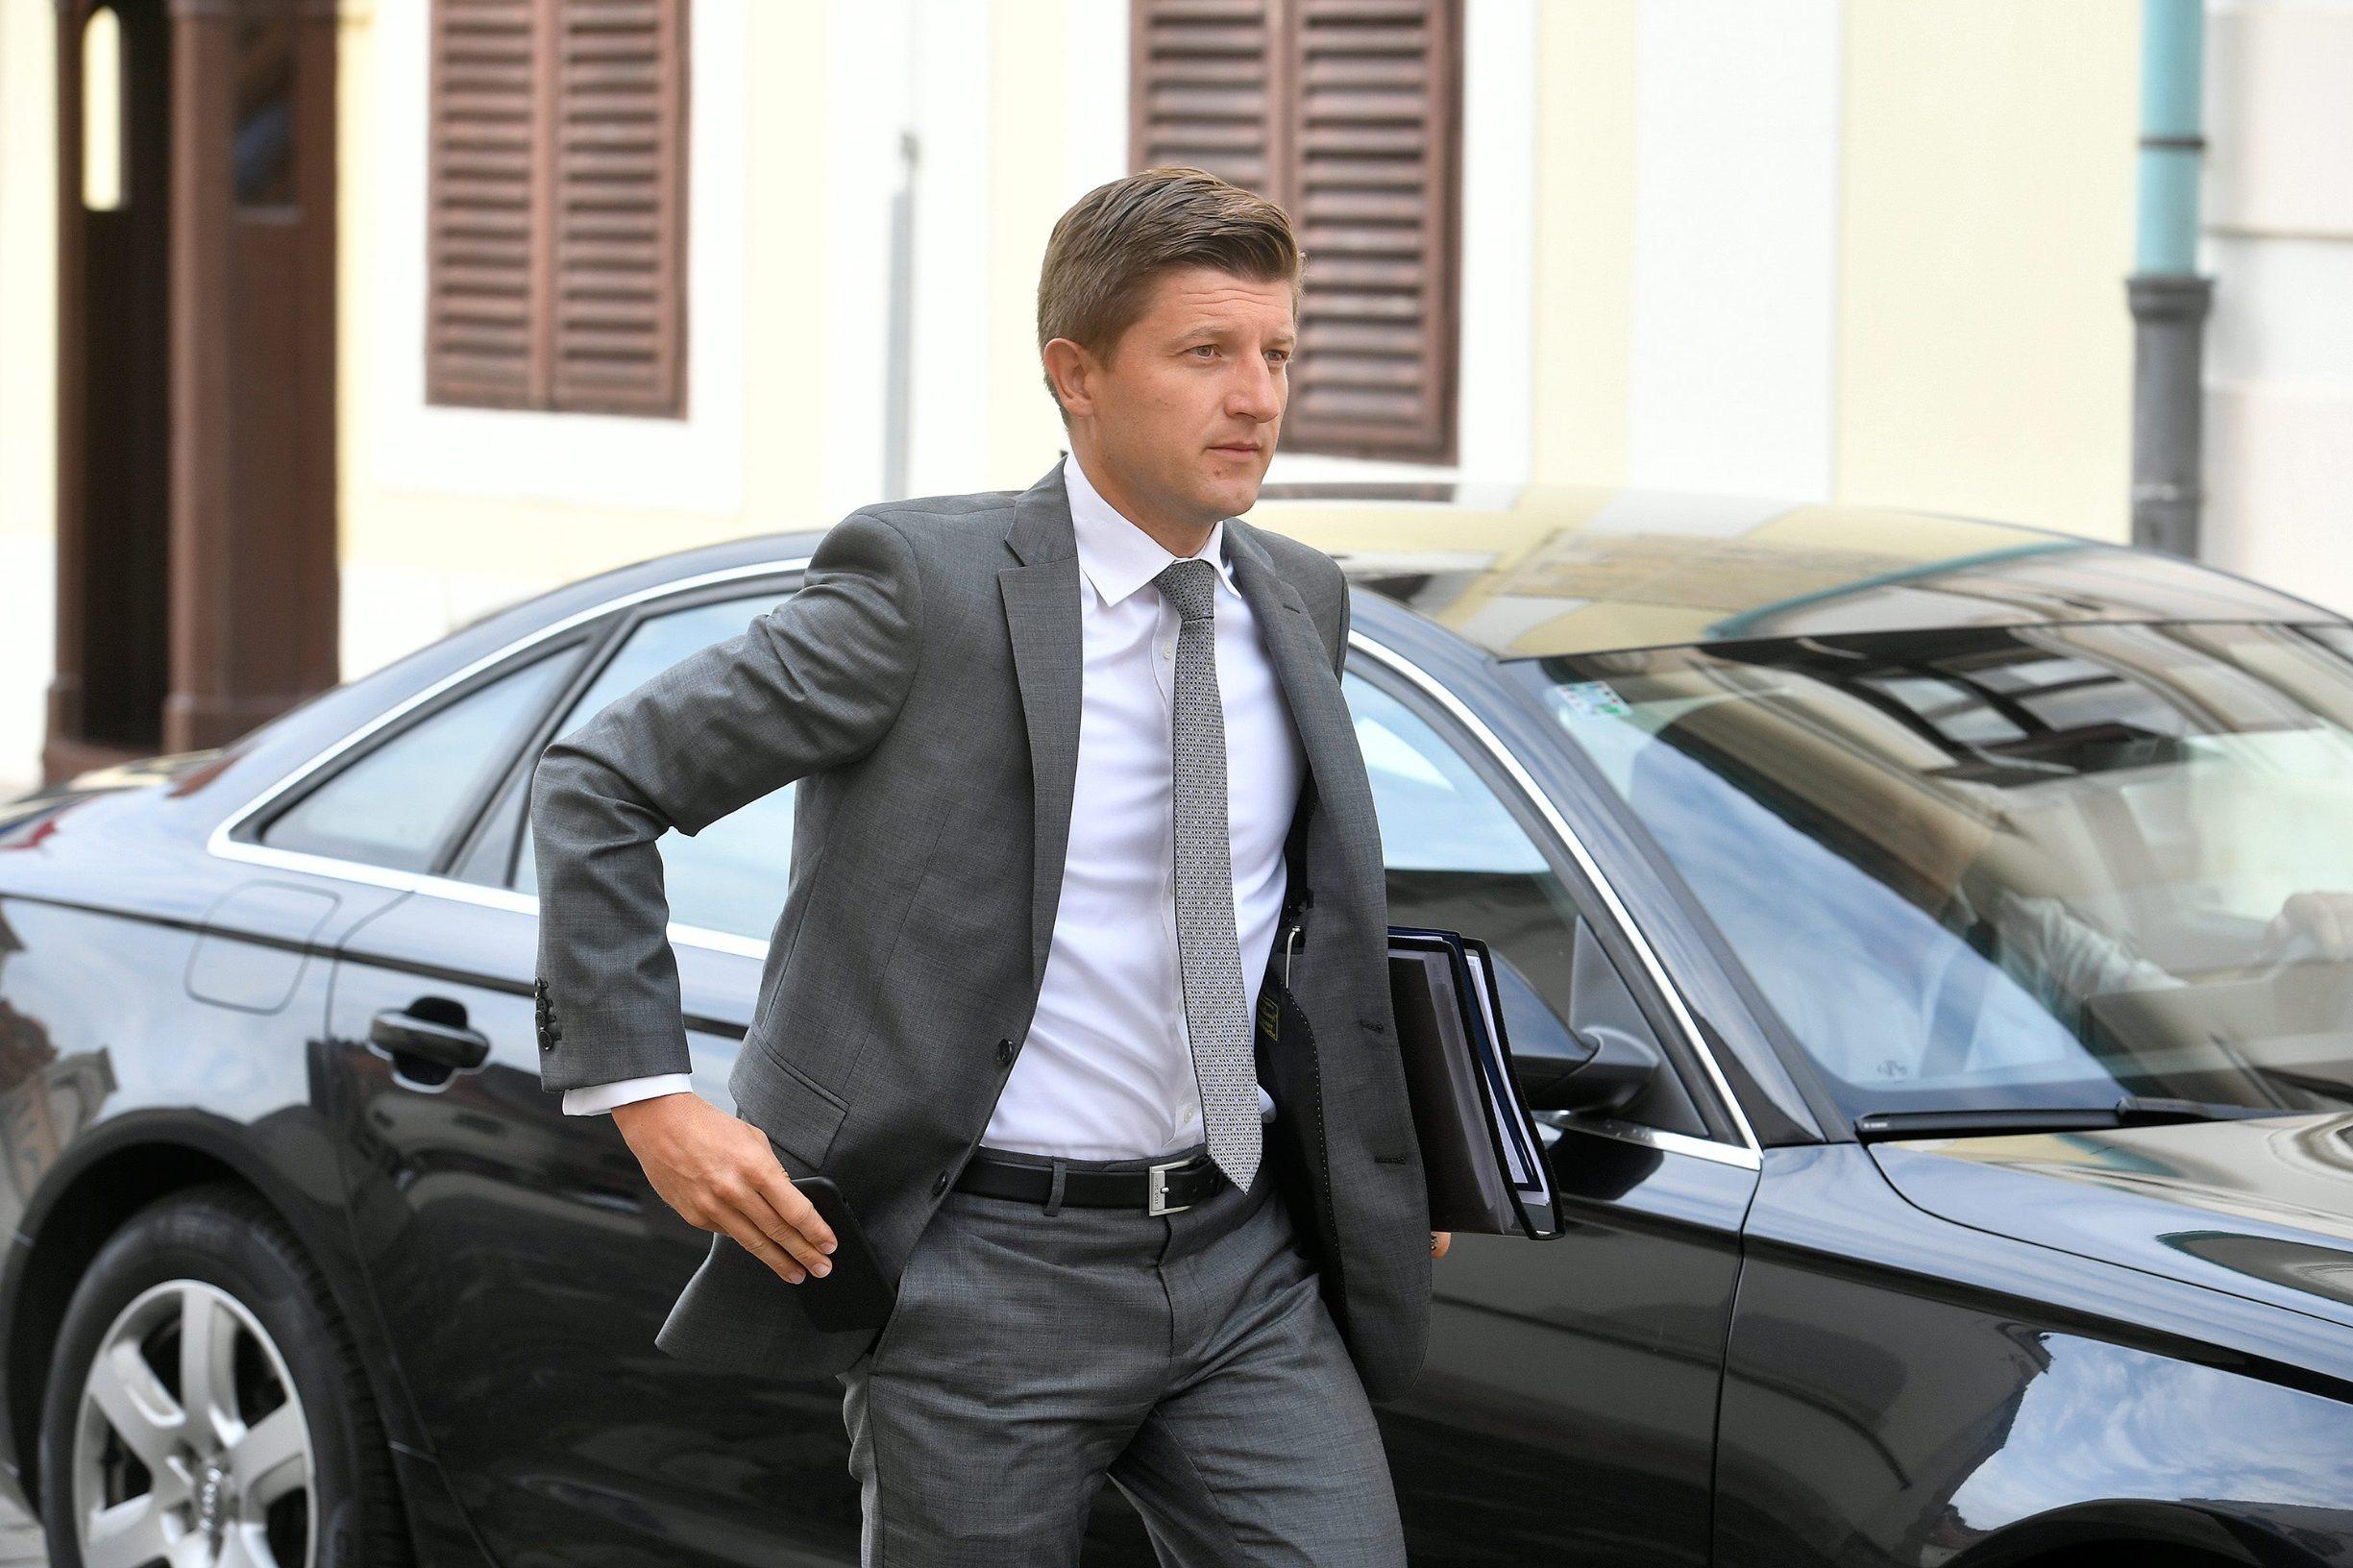 Deputy prime minister and minister of finance Zdravko Marić